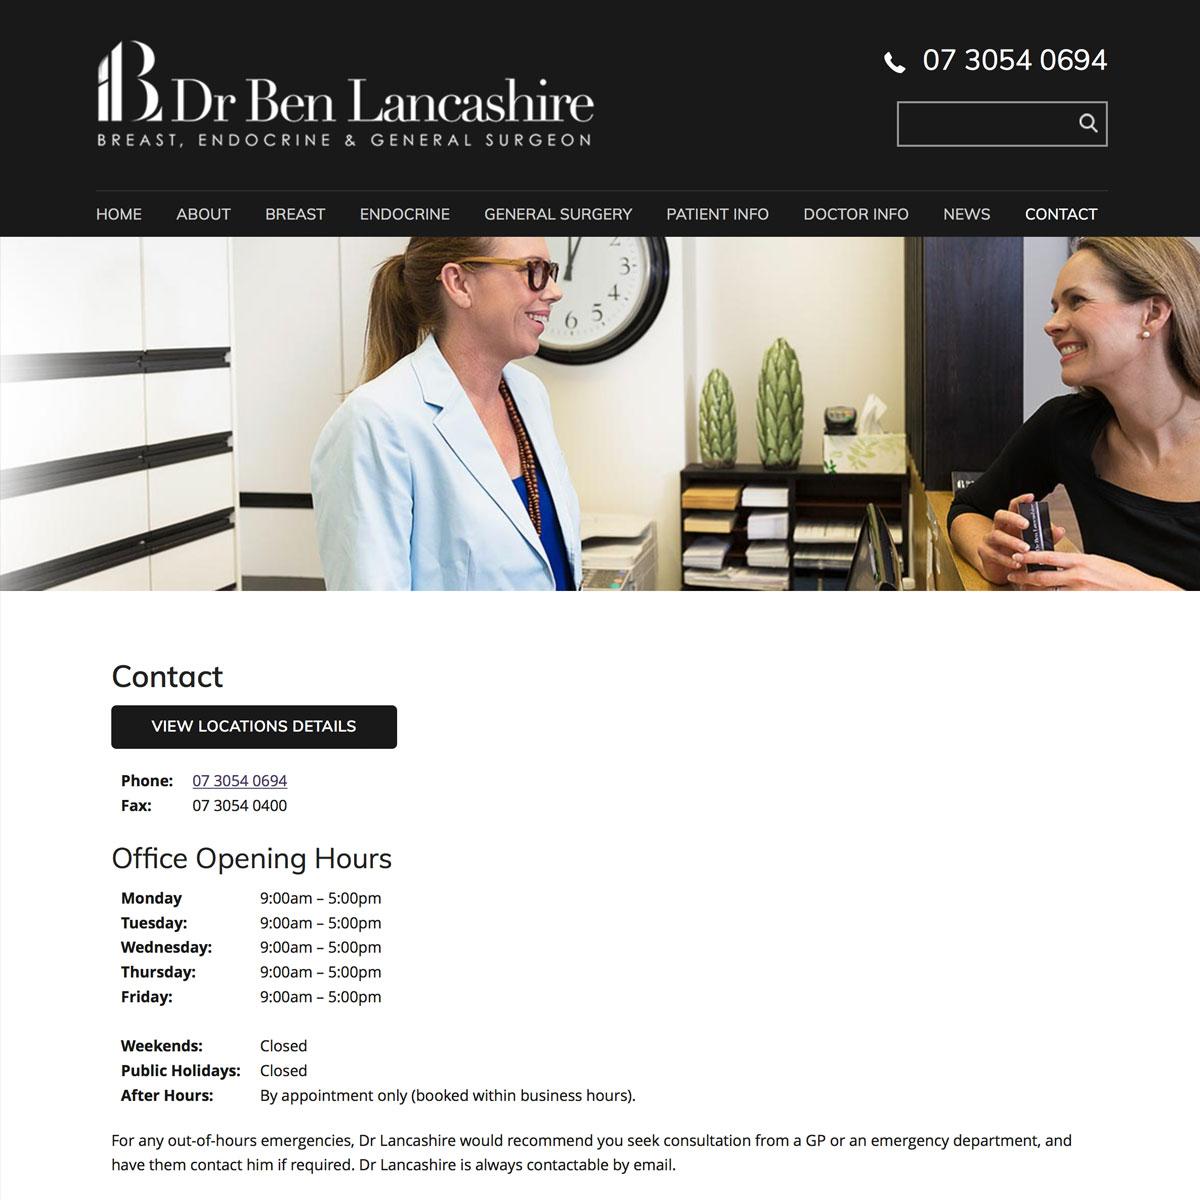 Dr Ben Lancashire - Contact